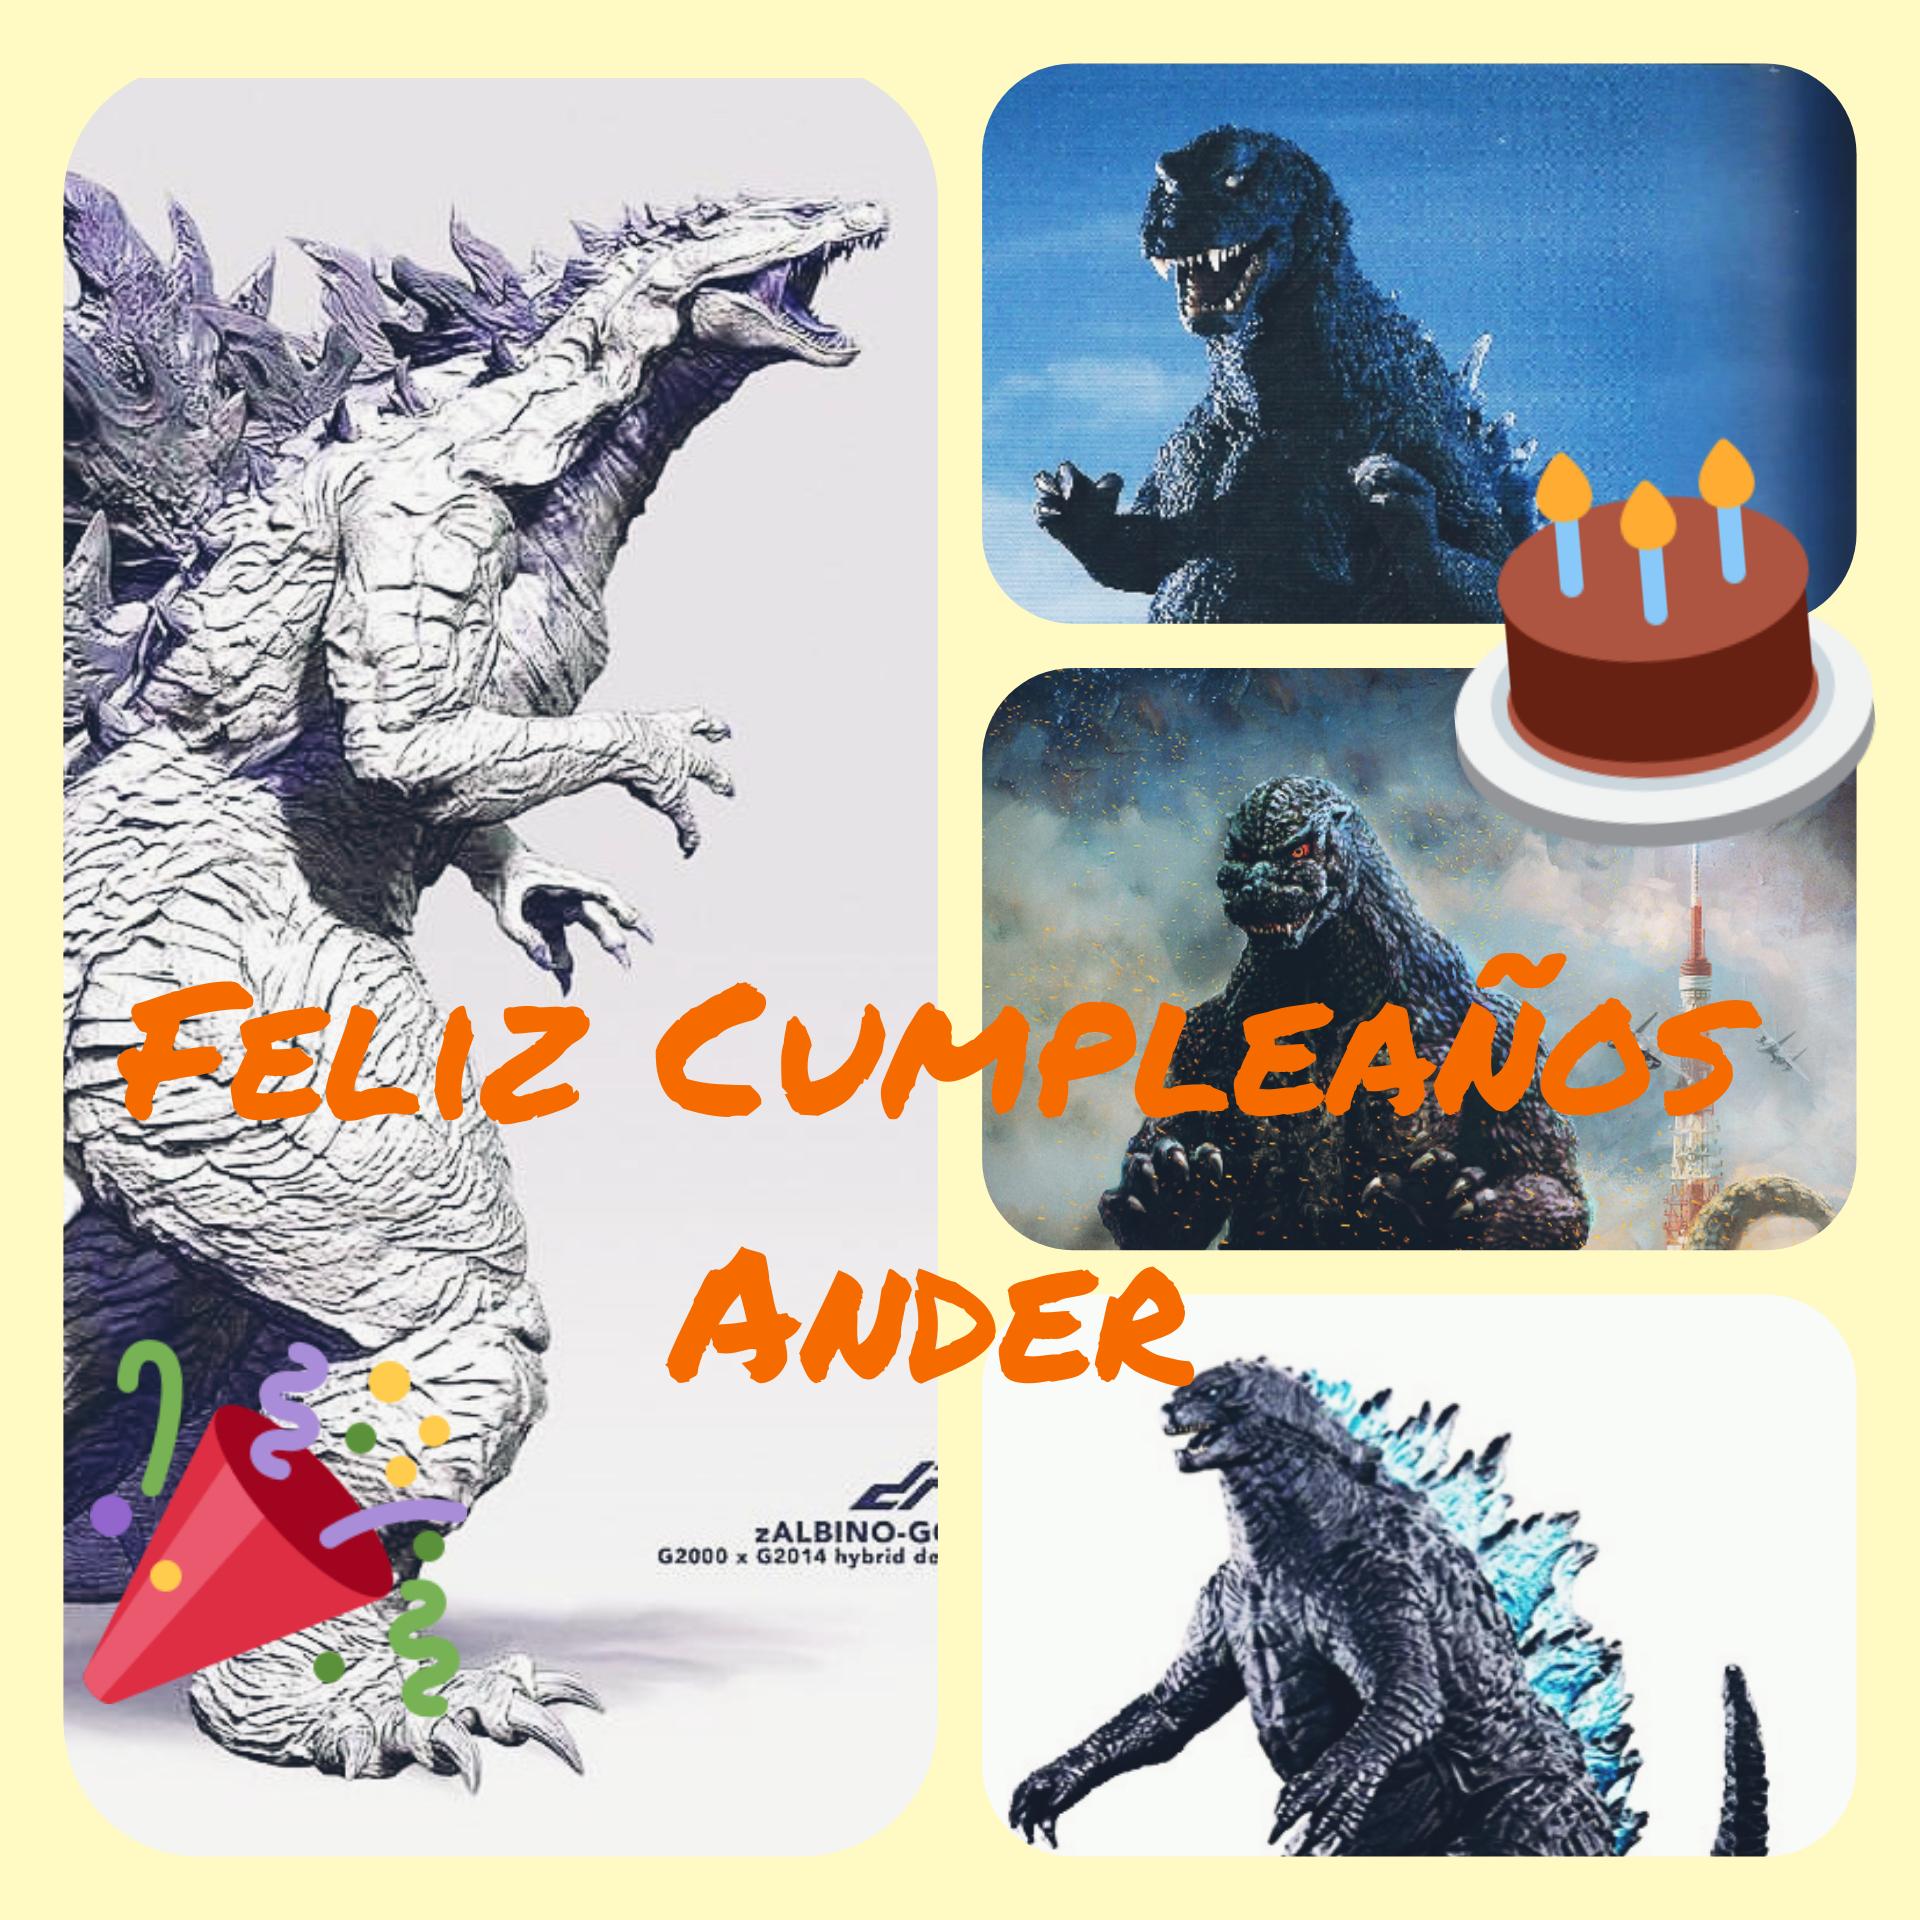 Feliz Cumpleaños Anderthegamer